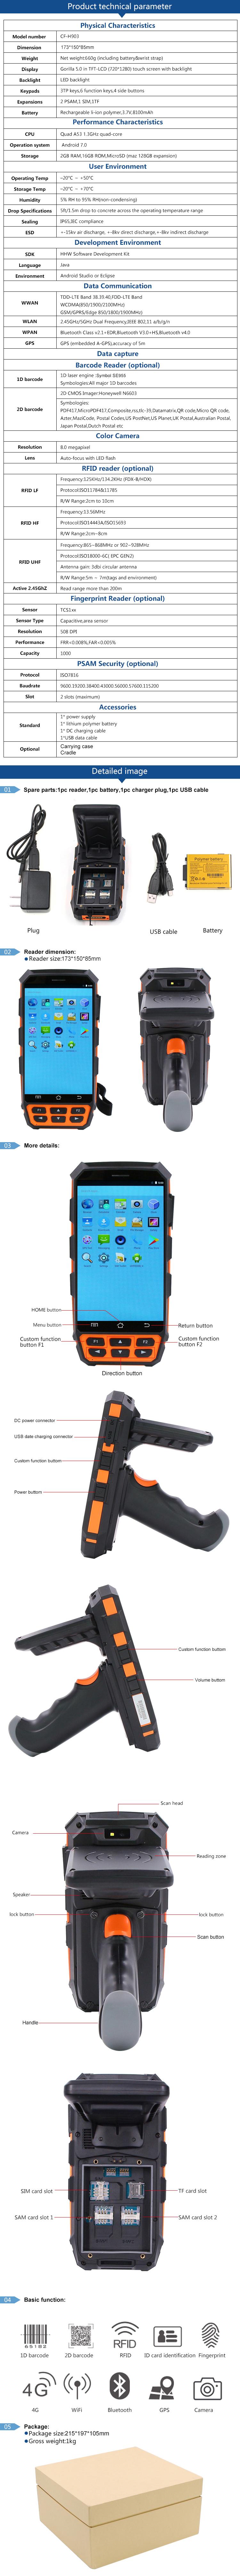 Chafon windows ce bluetooth/wifi/barcode rugged handheld rfid reader